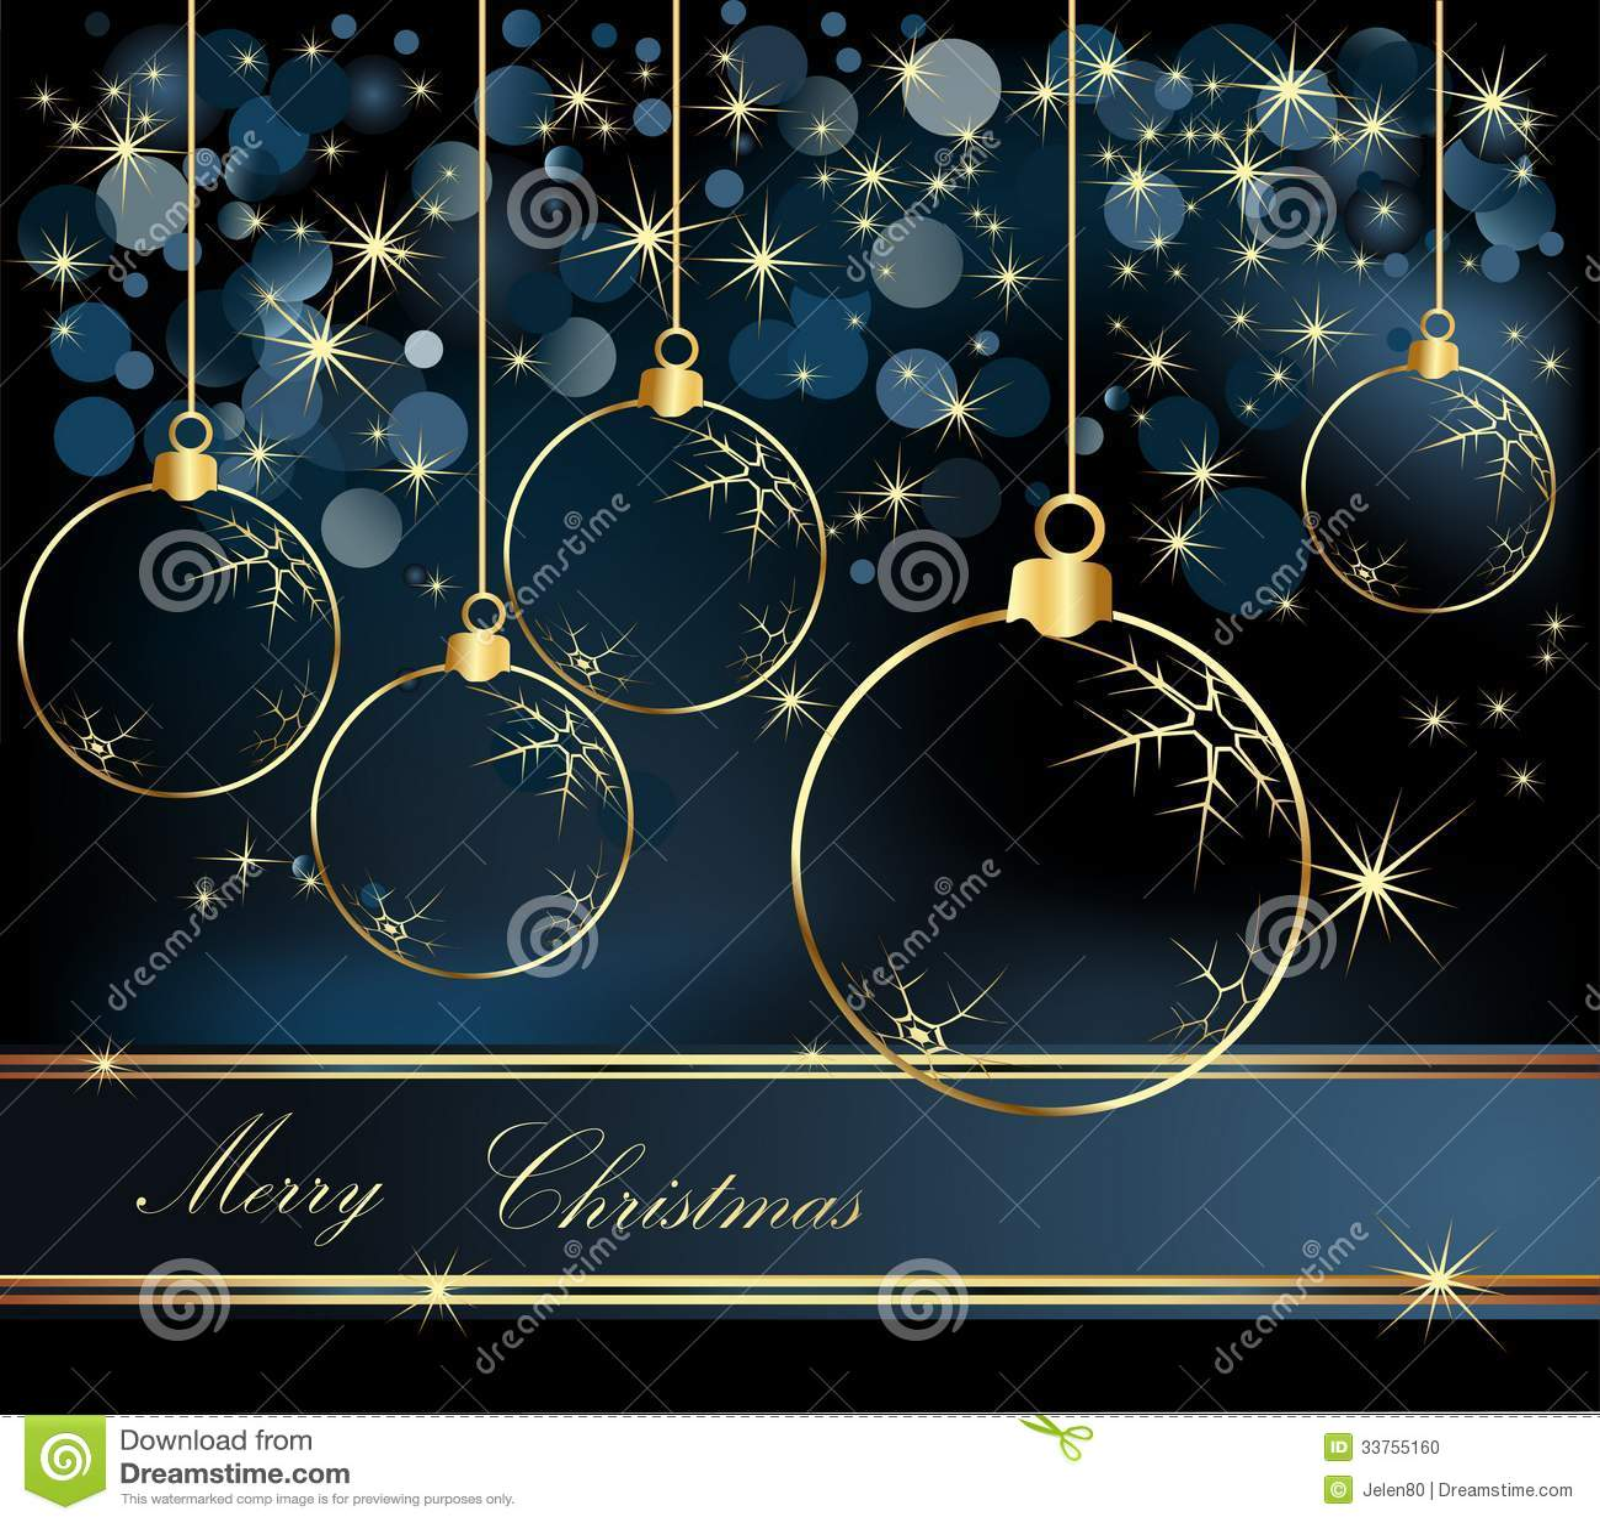 Merry Christmas Background Stock Photo Image 33755160